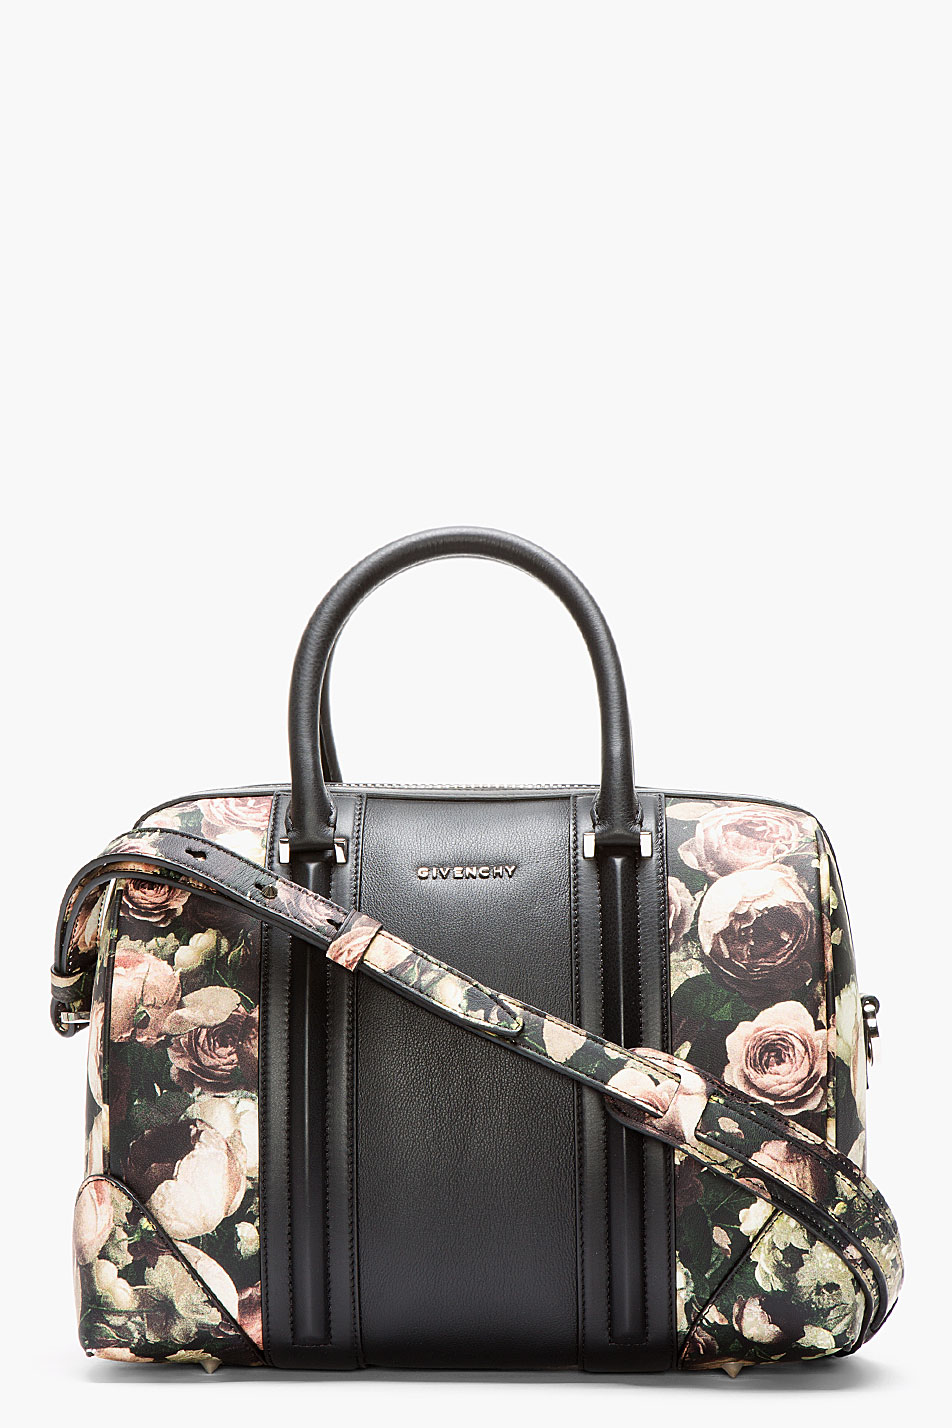 37119dbd0c Lyst - Givenchy Black Leather Floral Lucrezia Duffle Bag in Black